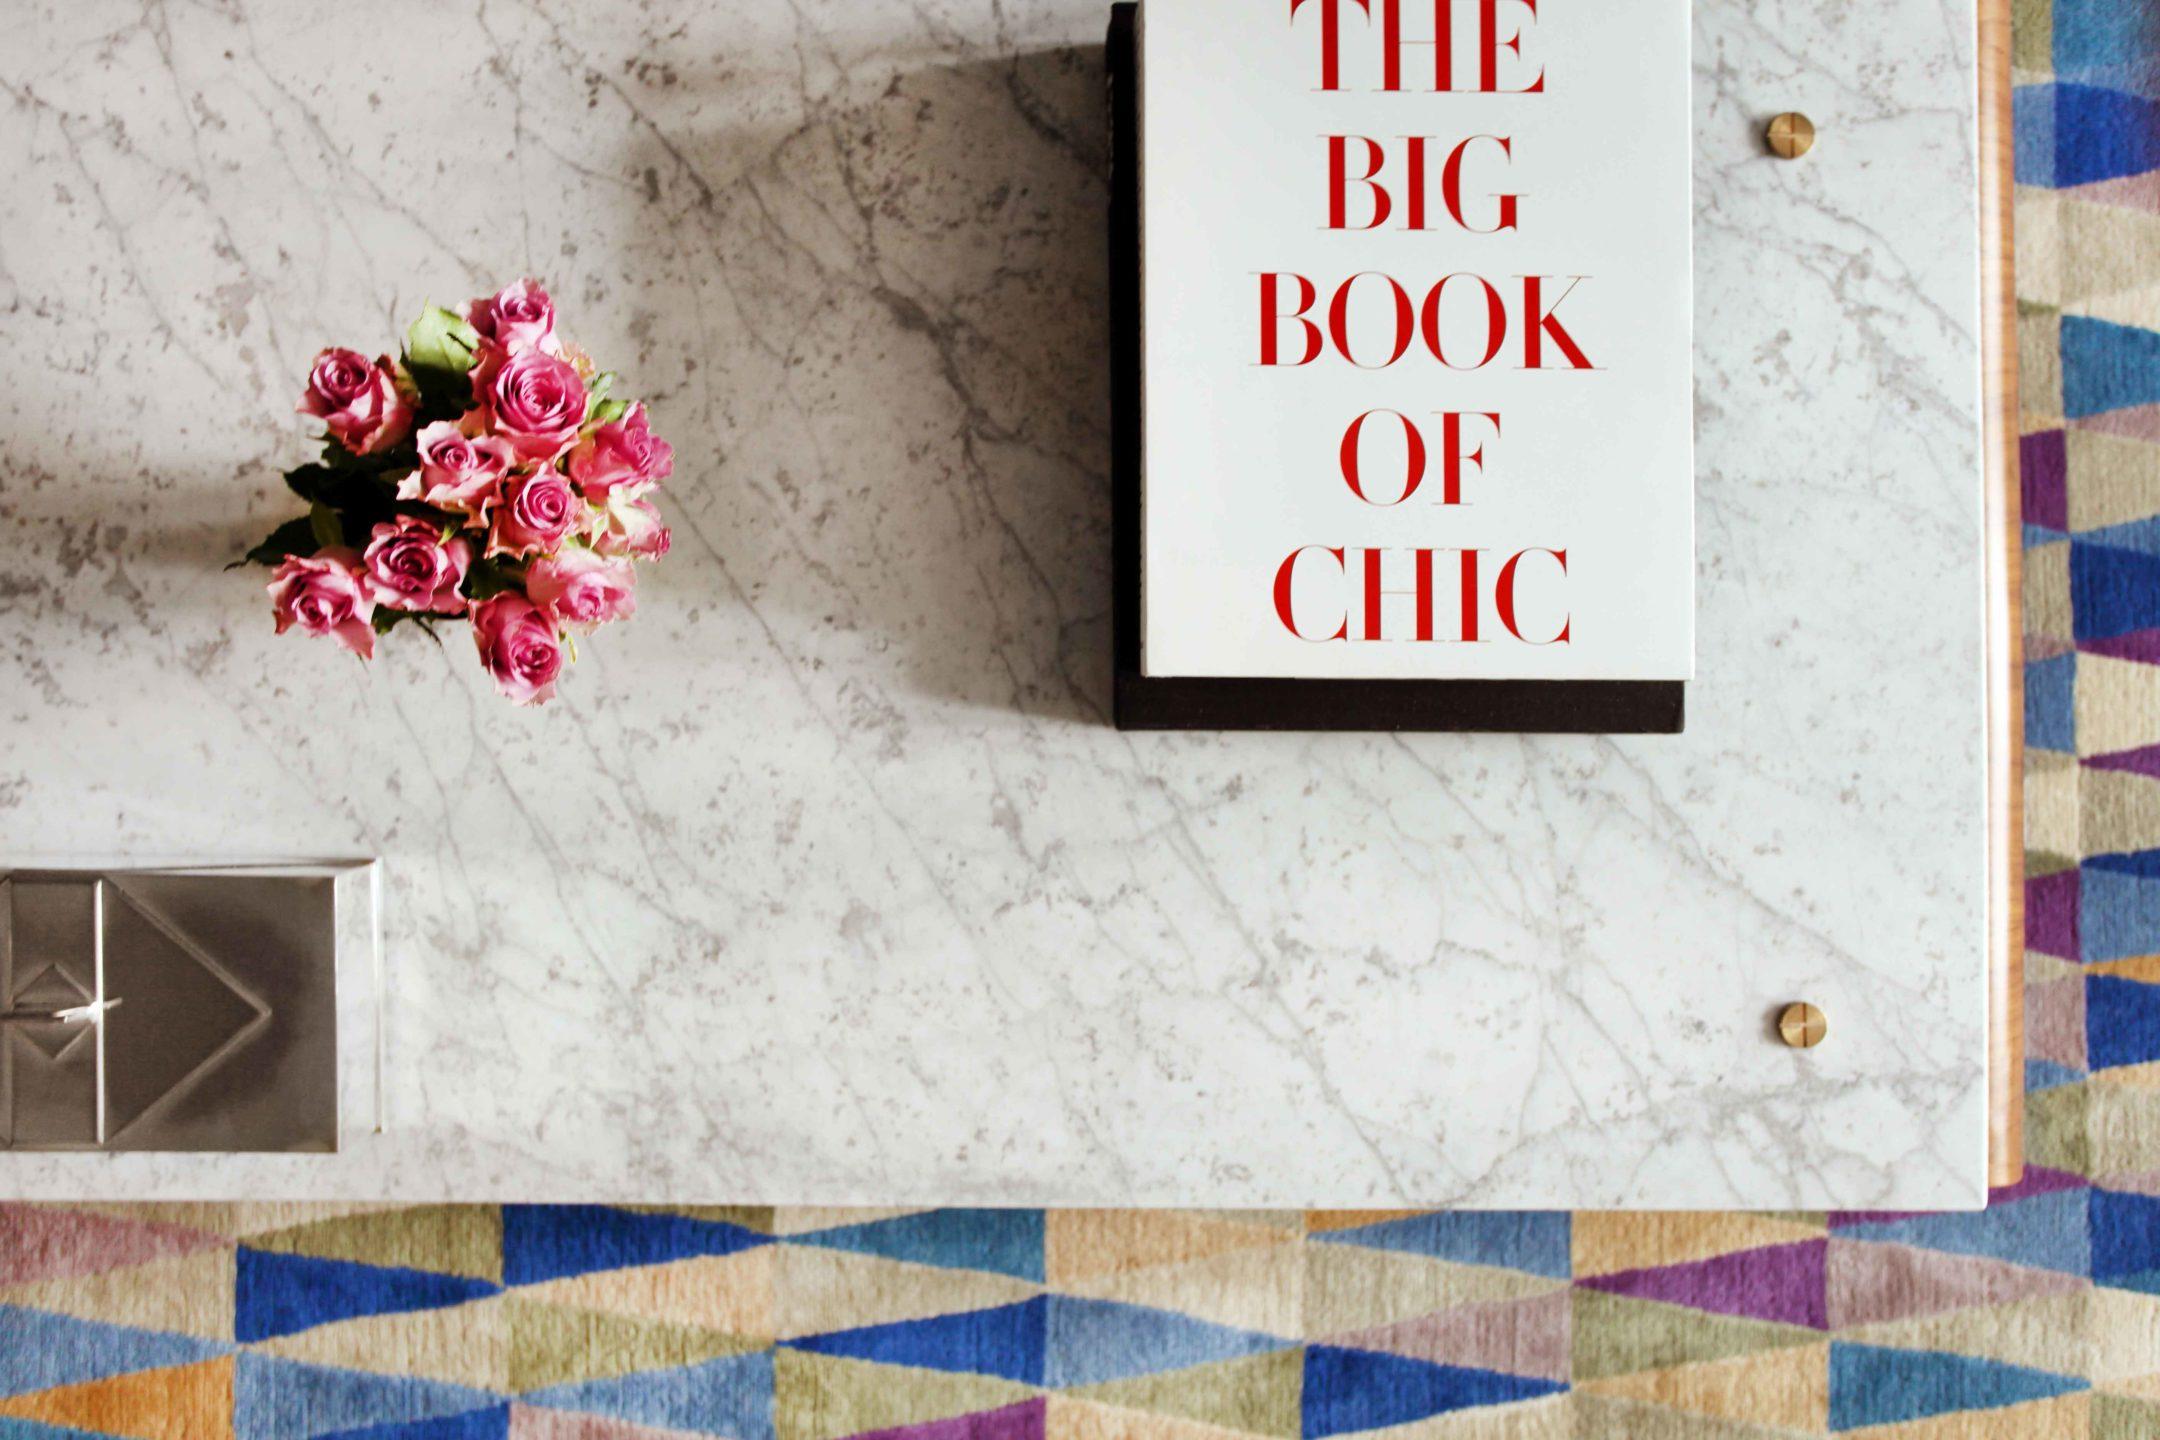 Nicole-Fuller-Interior-Designer-west-village-counter-the-big-book-of-chic-3